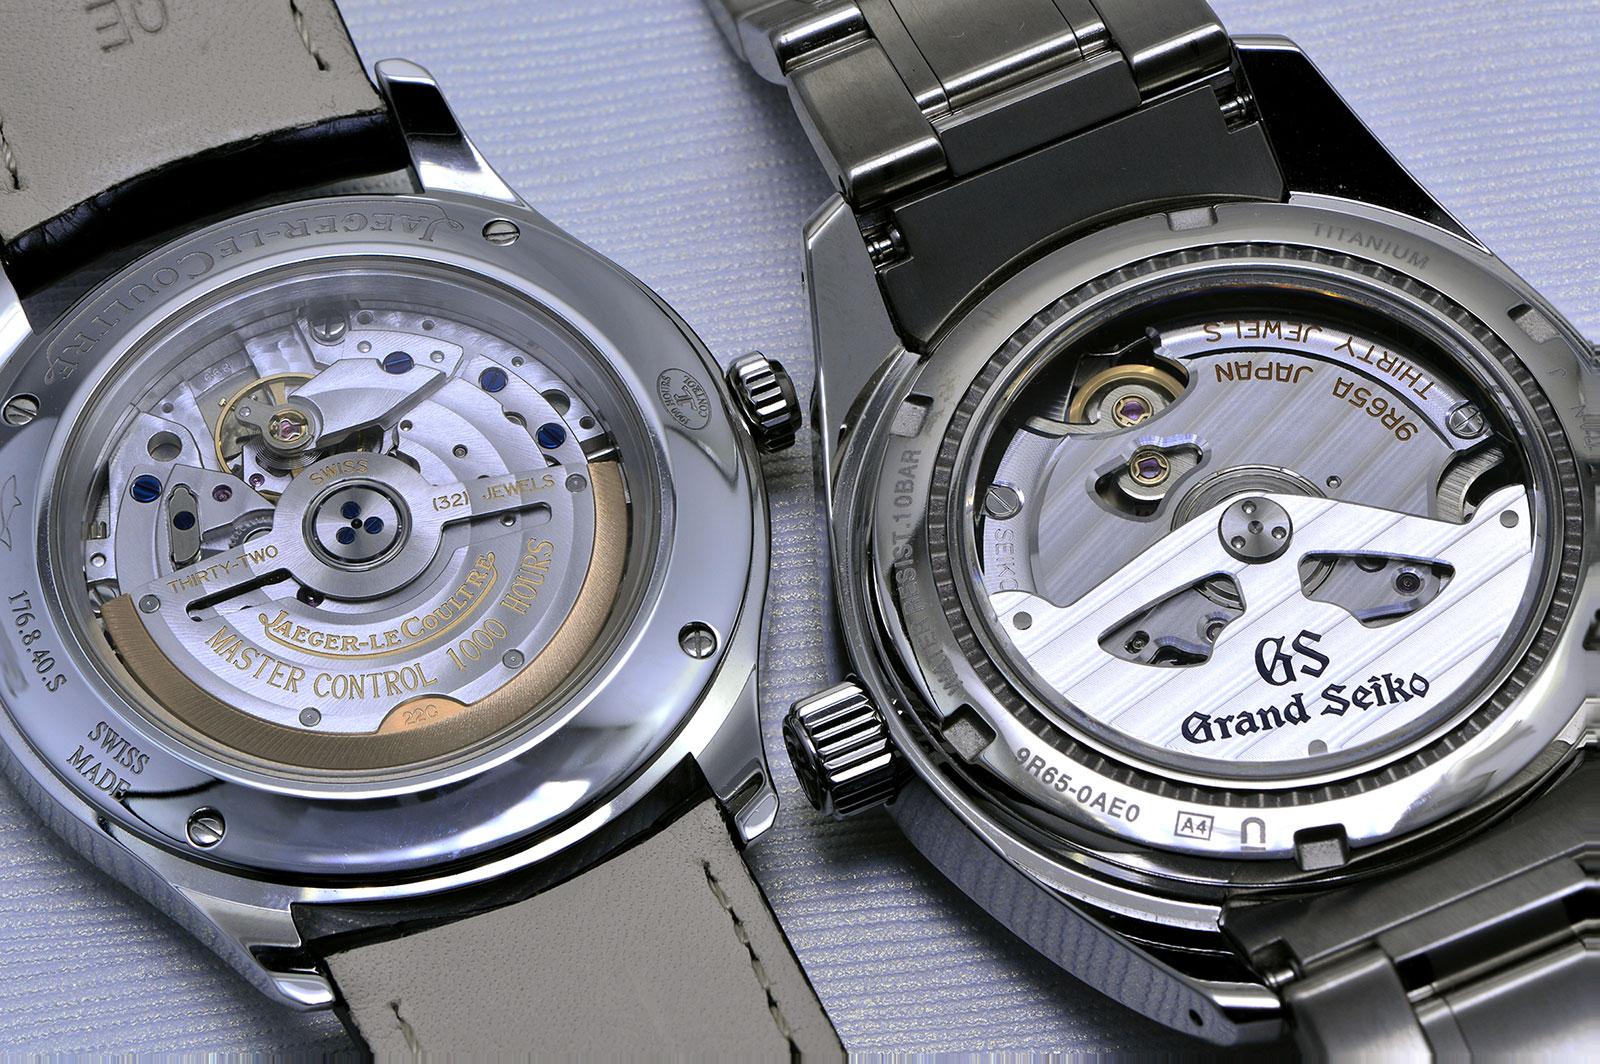 JLC-Master-Control-Date-vs-Grand-Seiko-Snowflake-6